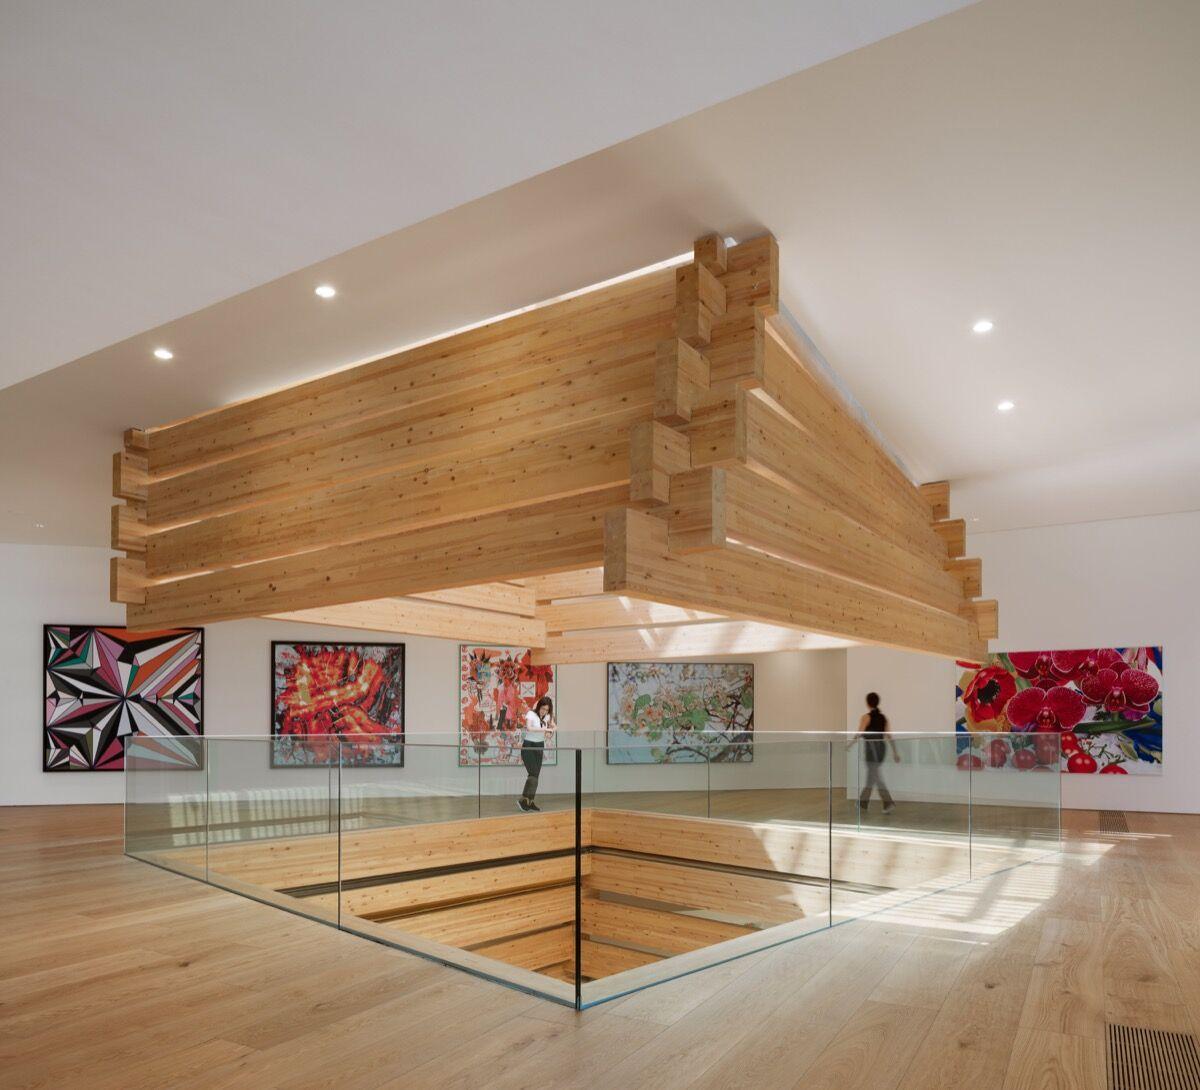 Interior view of OMM. Photo by Kengo Kuma and Associates. ©NAARO. Courtesy of the Odunpazari Modern Museum (OMM).